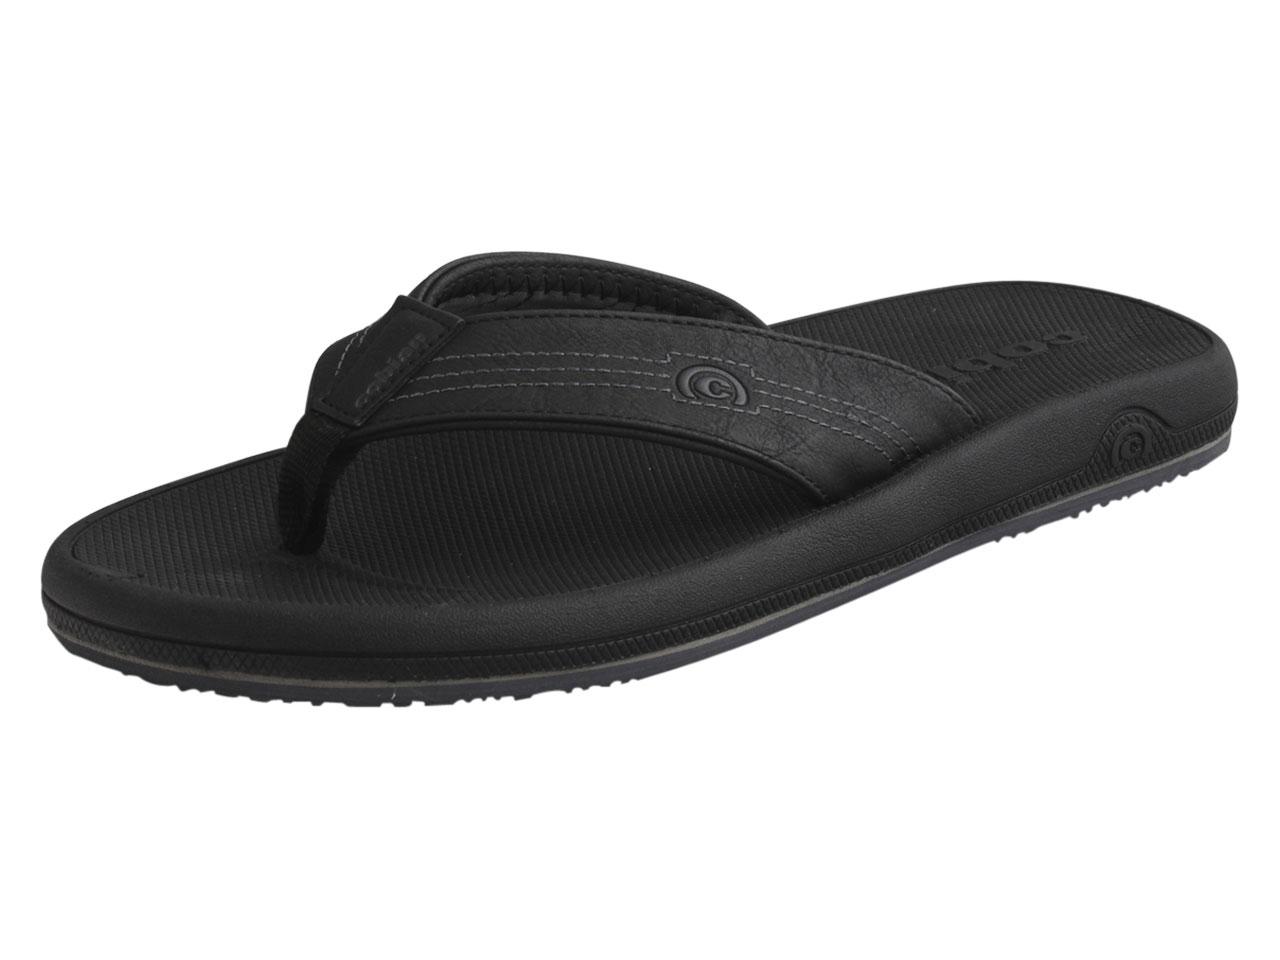 66d877b61 Cobian Men s OTG Flip Flops Sandals Shoes